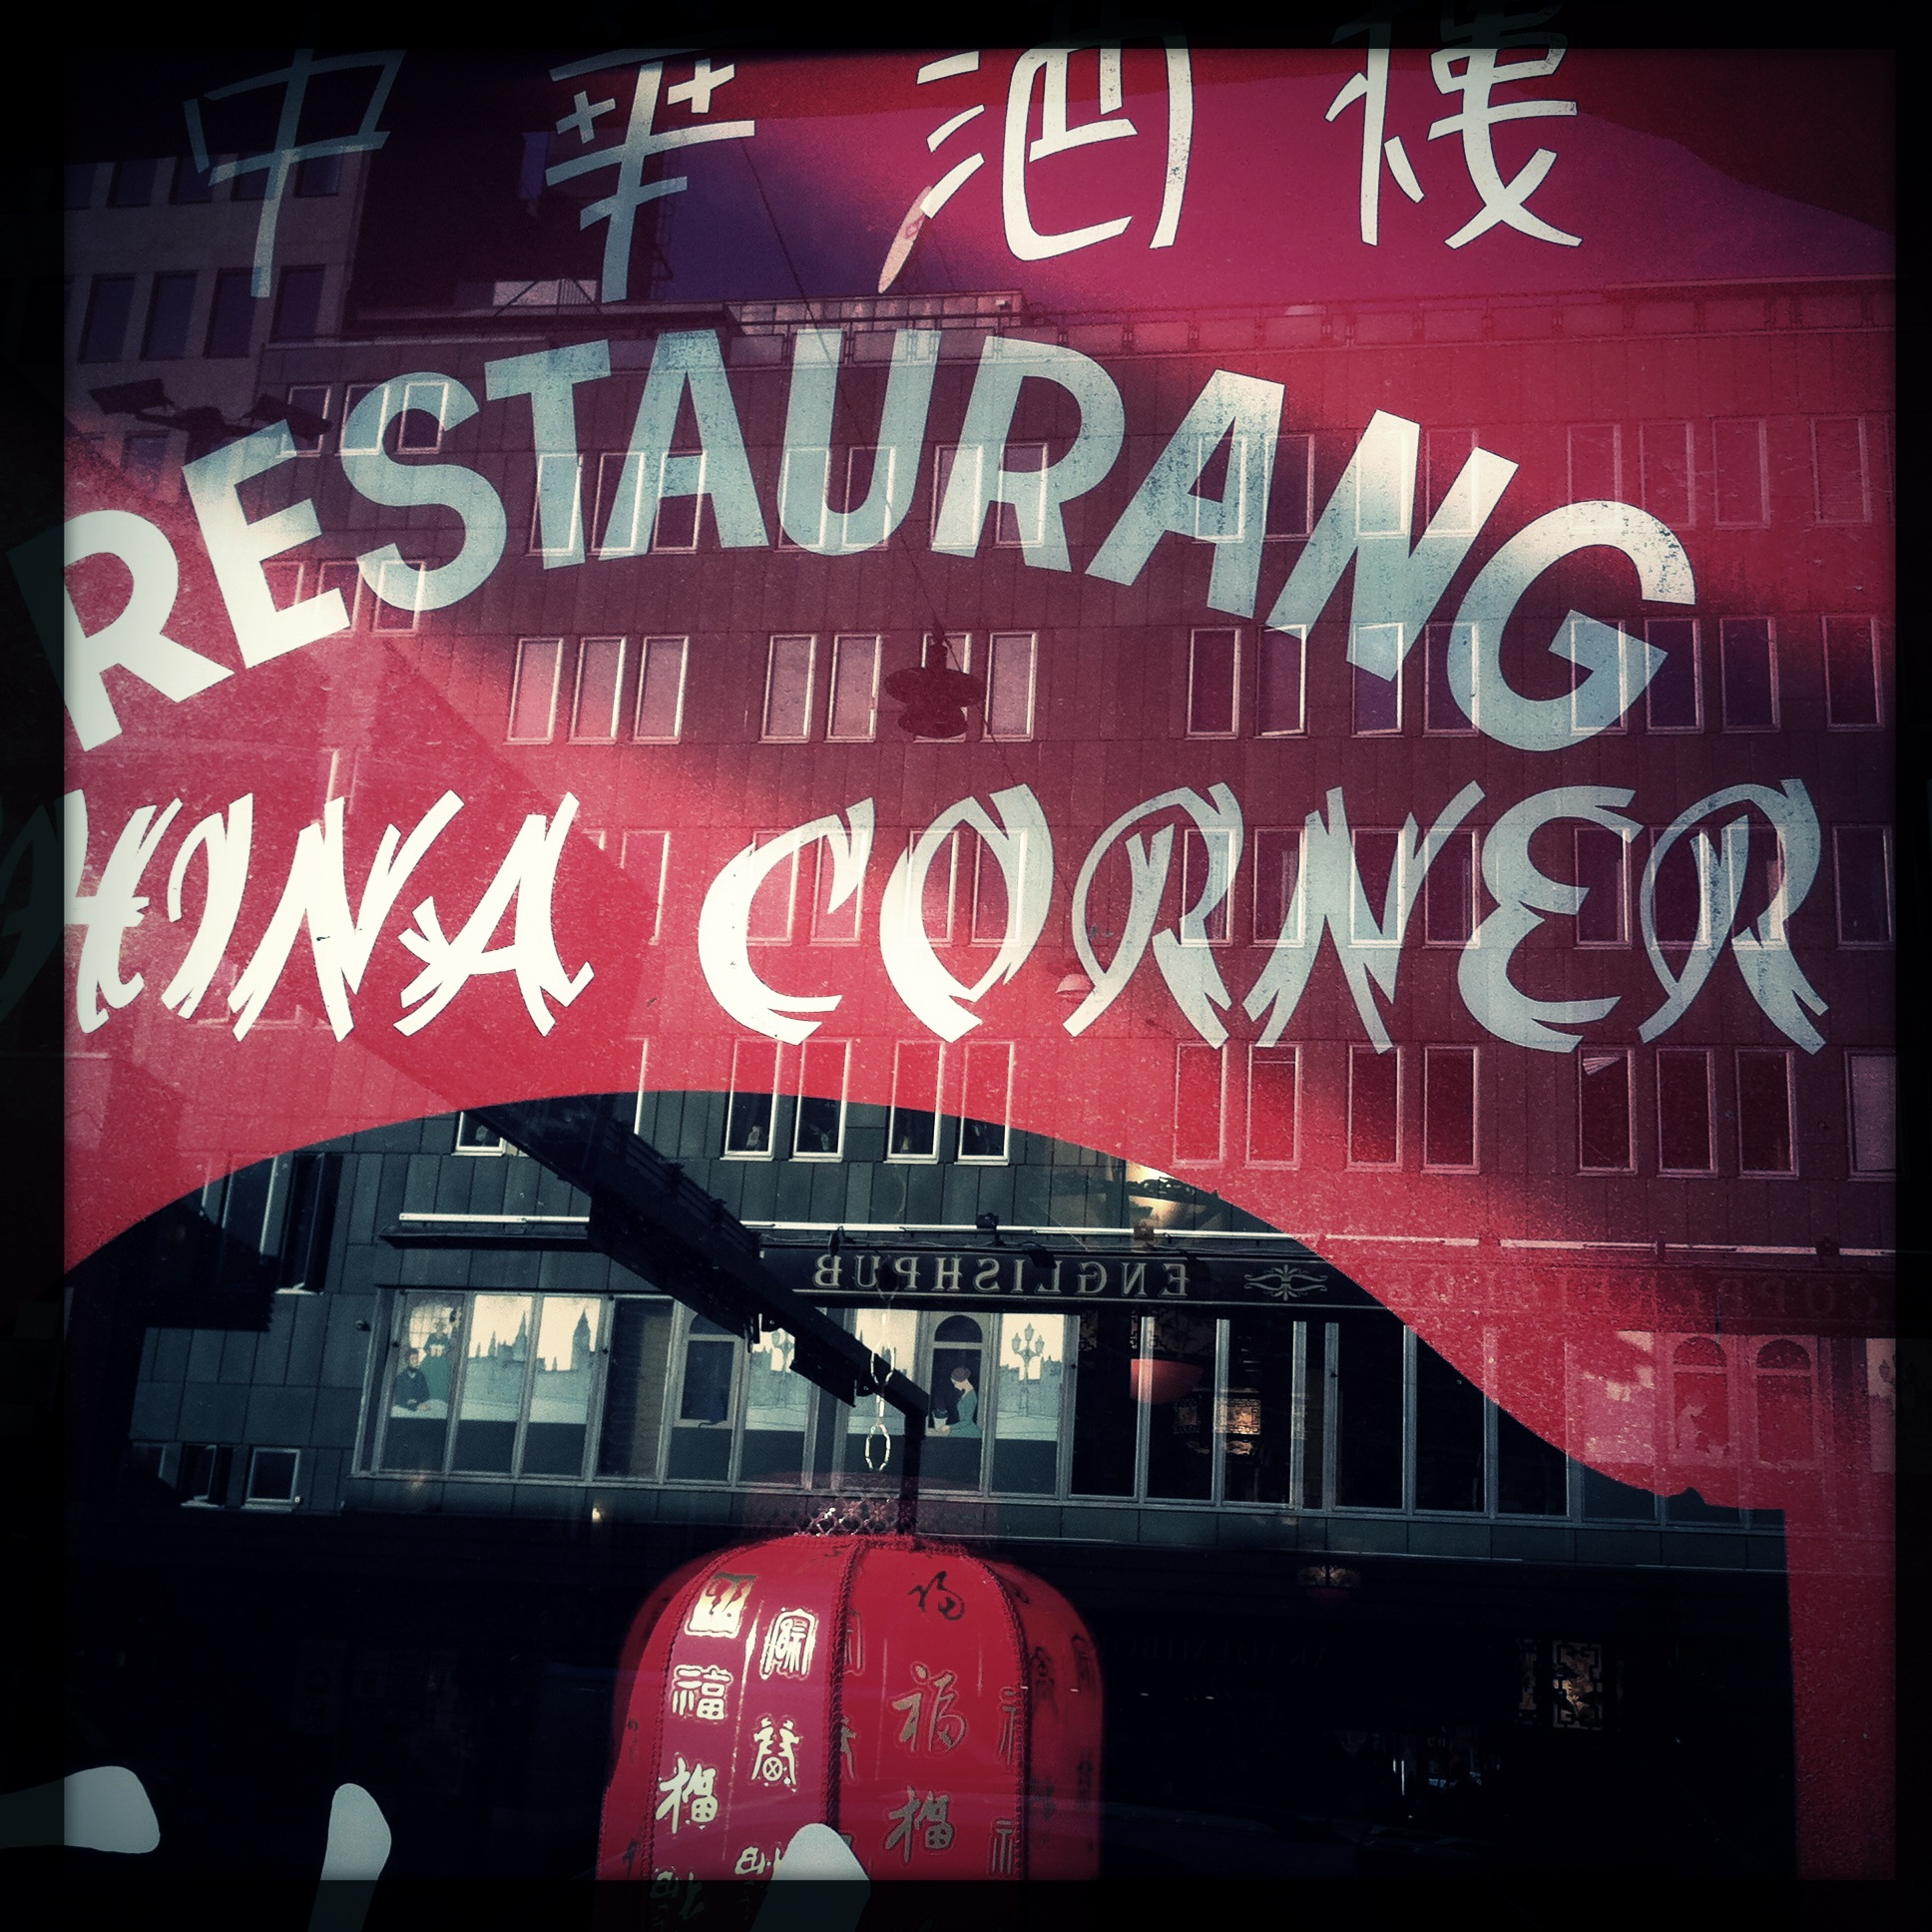 iPhoneography: China Corner